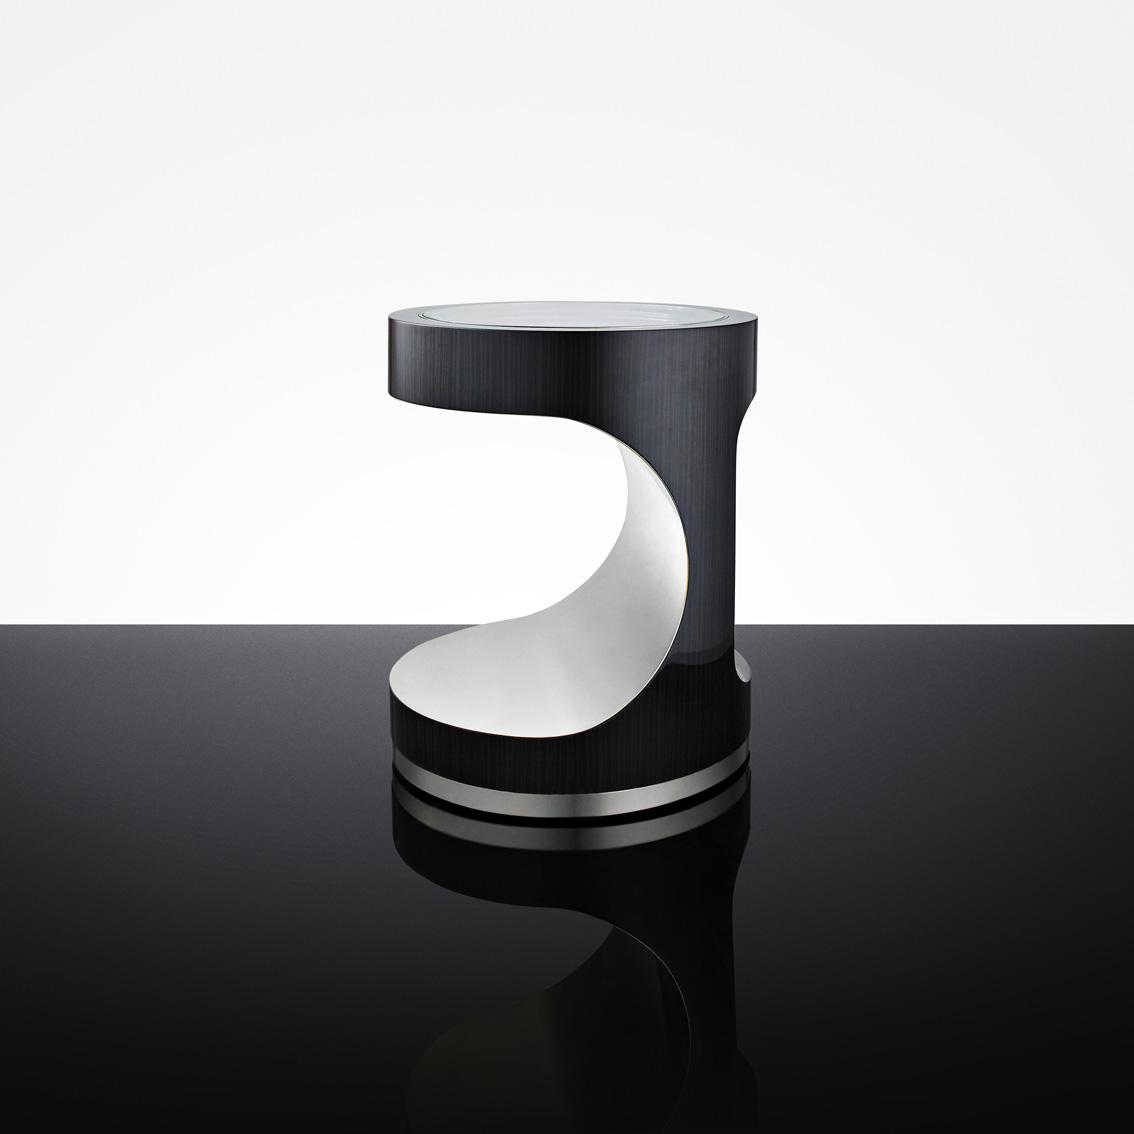 Interior designer blainey north 39 s latest furniture the interiors addict - Latest furniture ...